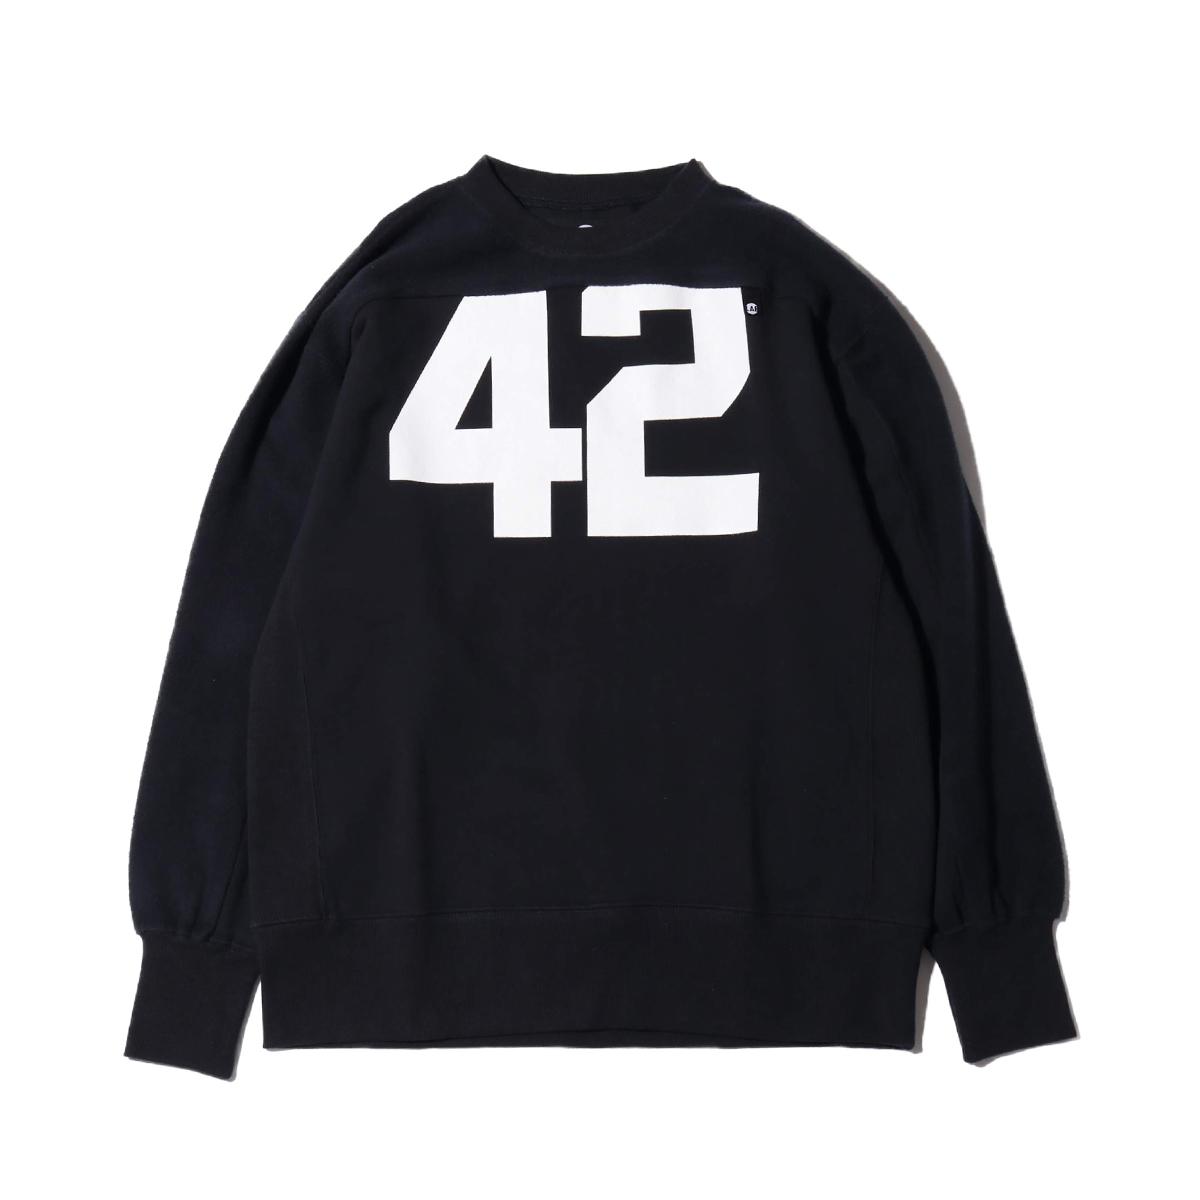 ATMOS LAB FOOTBALL SWEAT (BLACK) (atto MOS laboratory football sweat shirt)